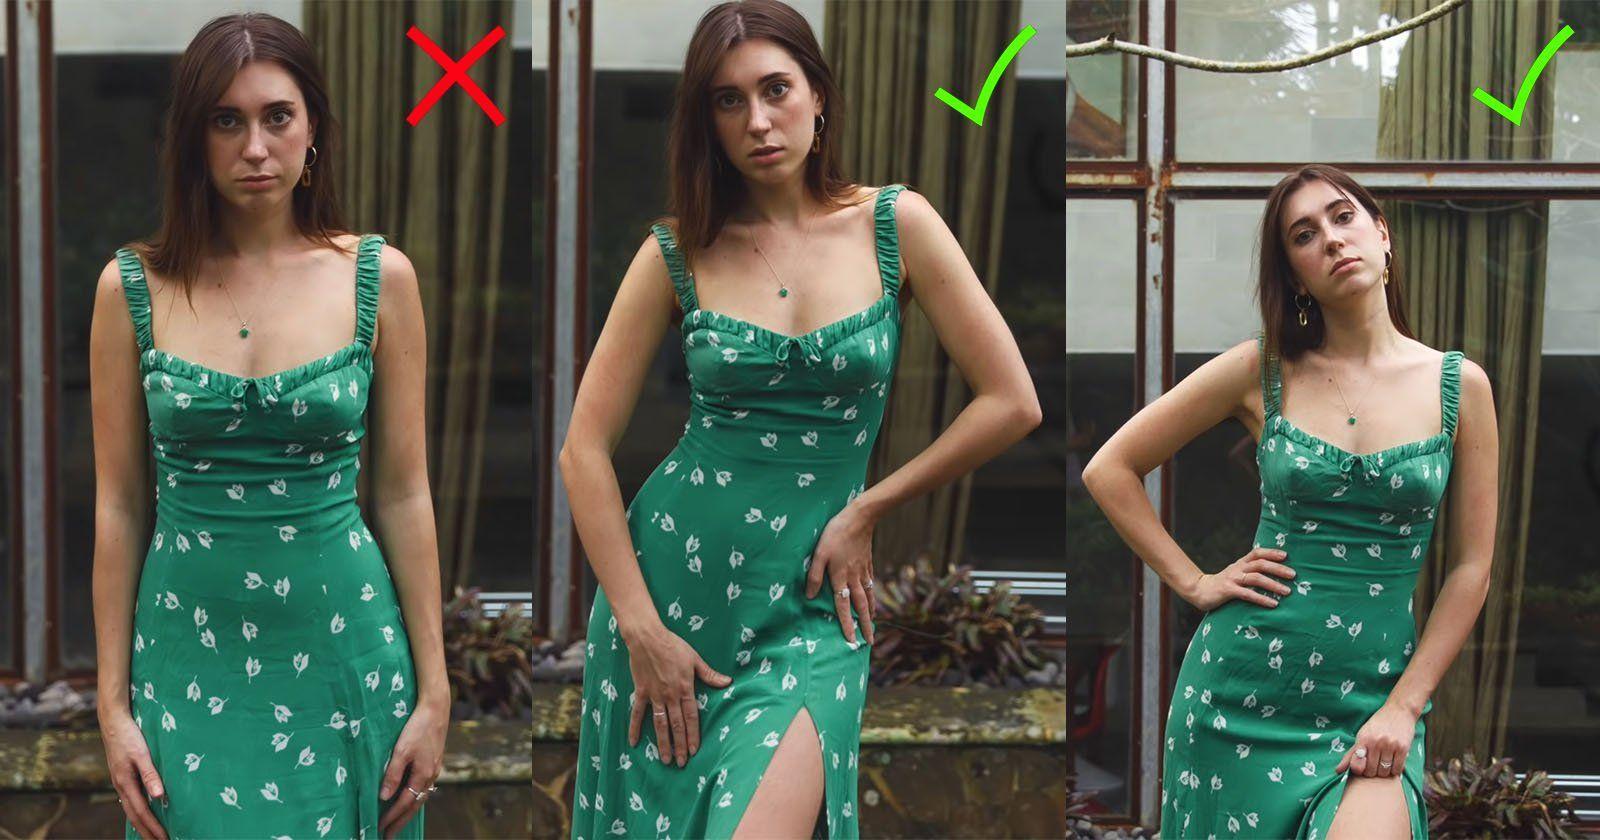 How to Pose Women Who Aren't Models – Poz verme ve taktikleri